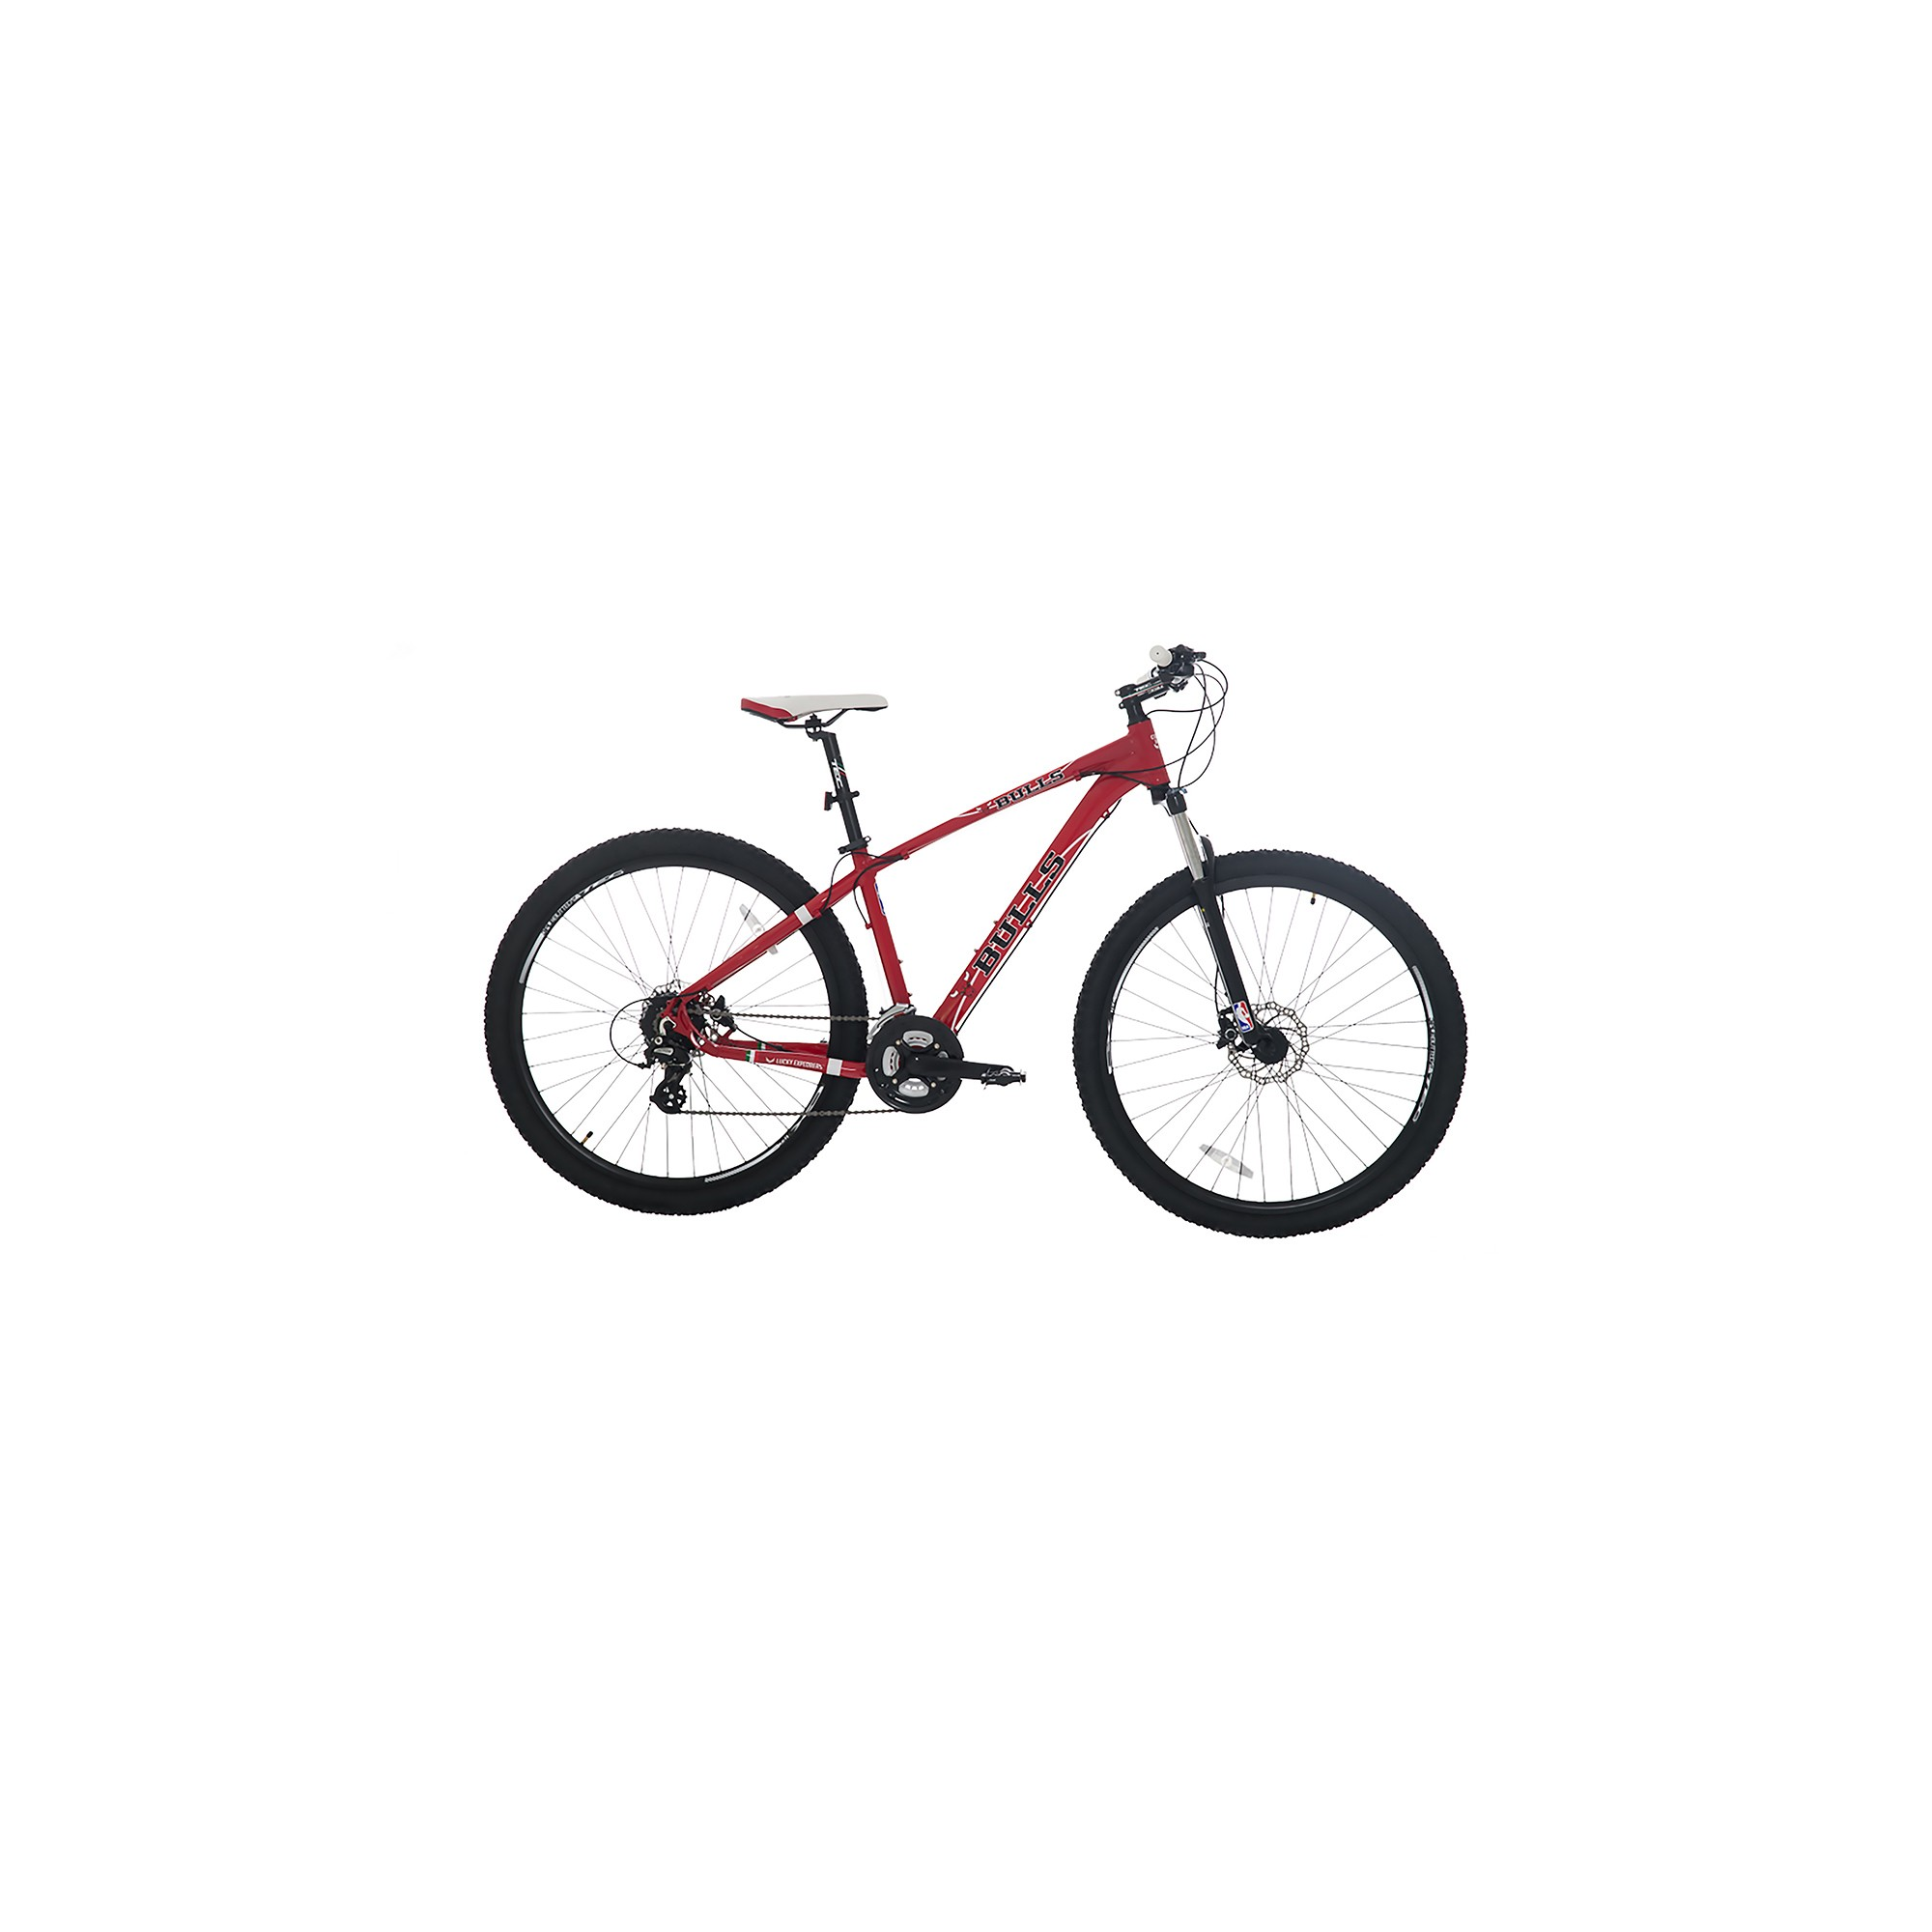 Chicago Bulls 29 Mountain Bike